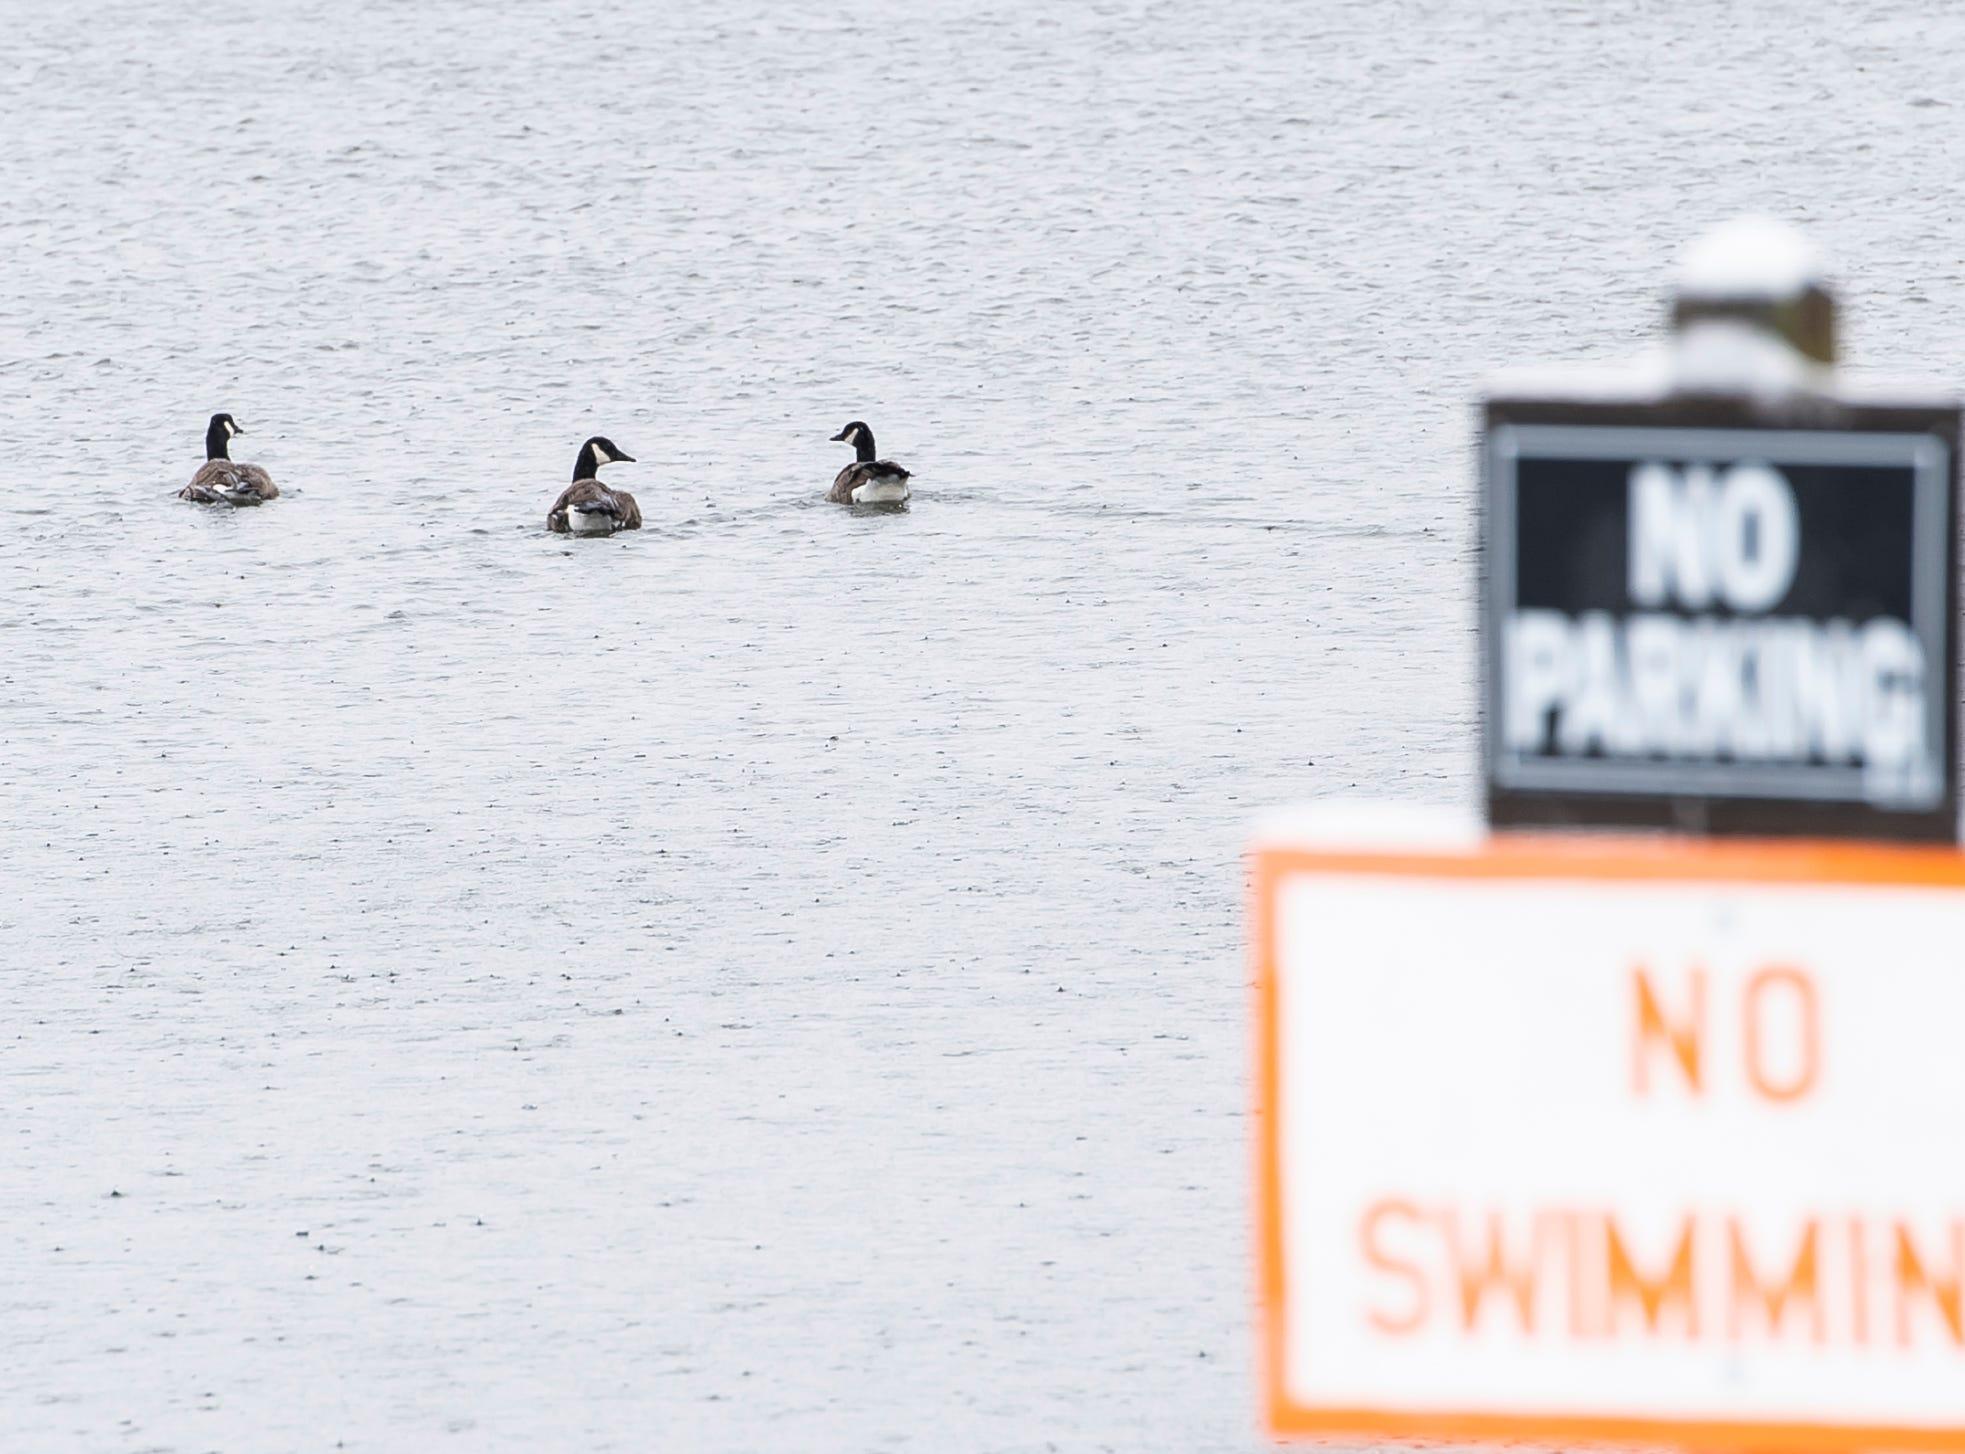 Ducks swim in Longarm Arm Reservoir Tuesday, February 12, 2019.